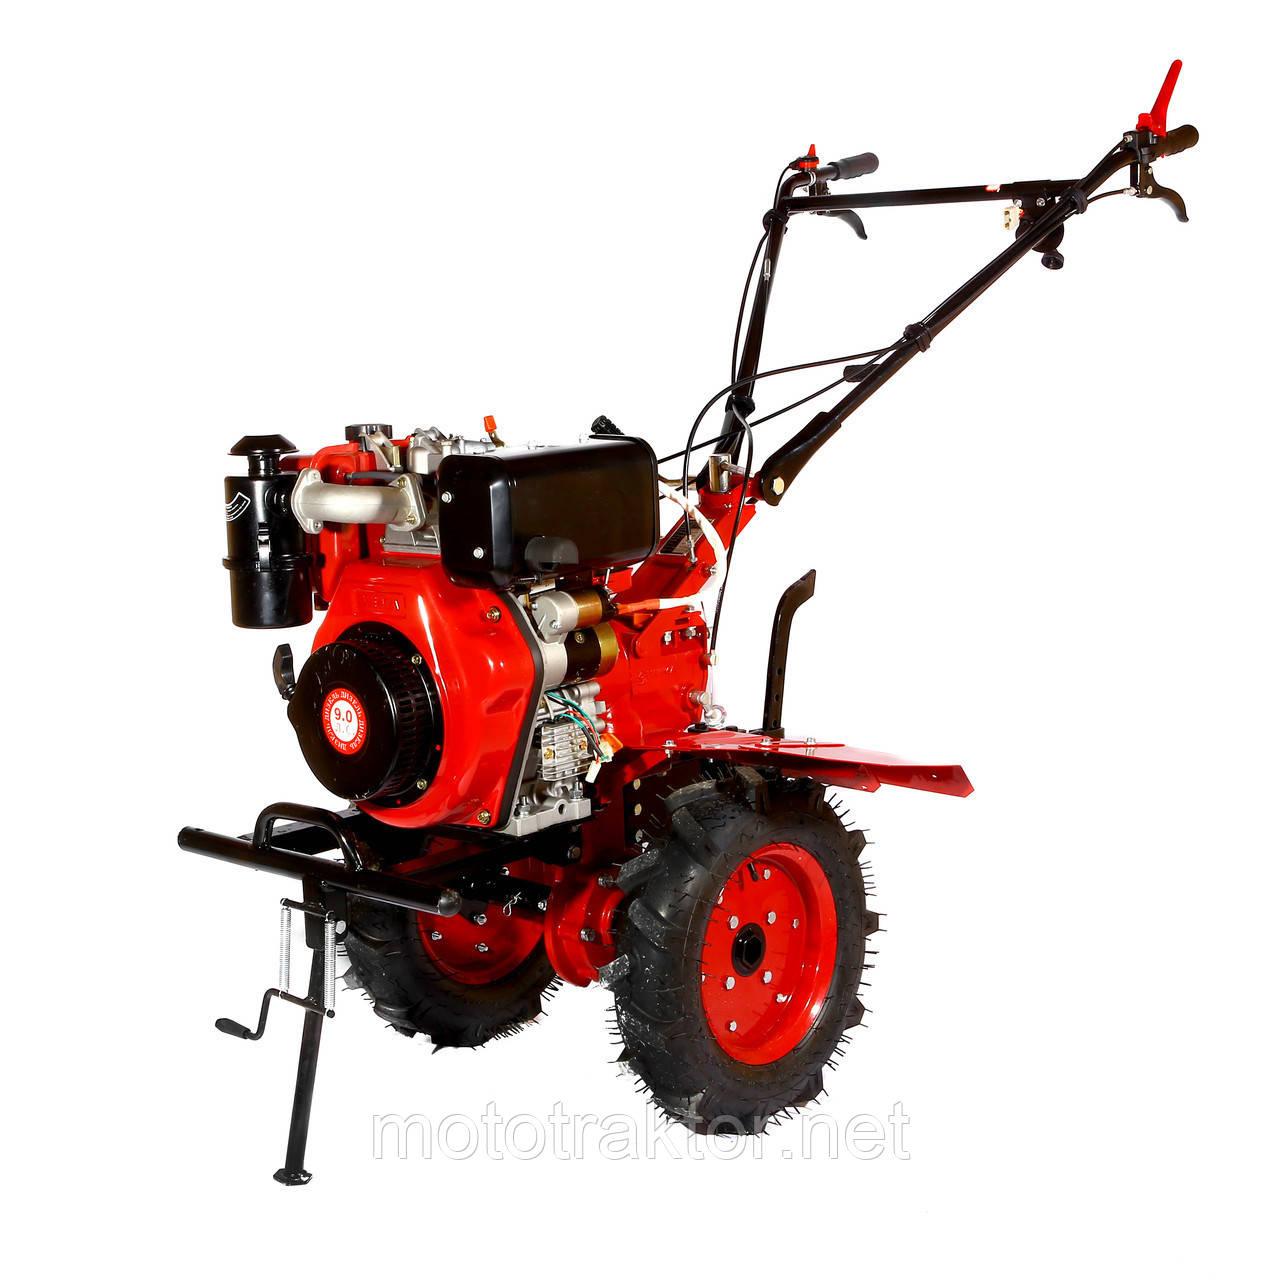 Мотоблок WEIMA WM1100BE (дизель 9л. с., електростартер, колеса 4.00-10) Безкоштовна доставка